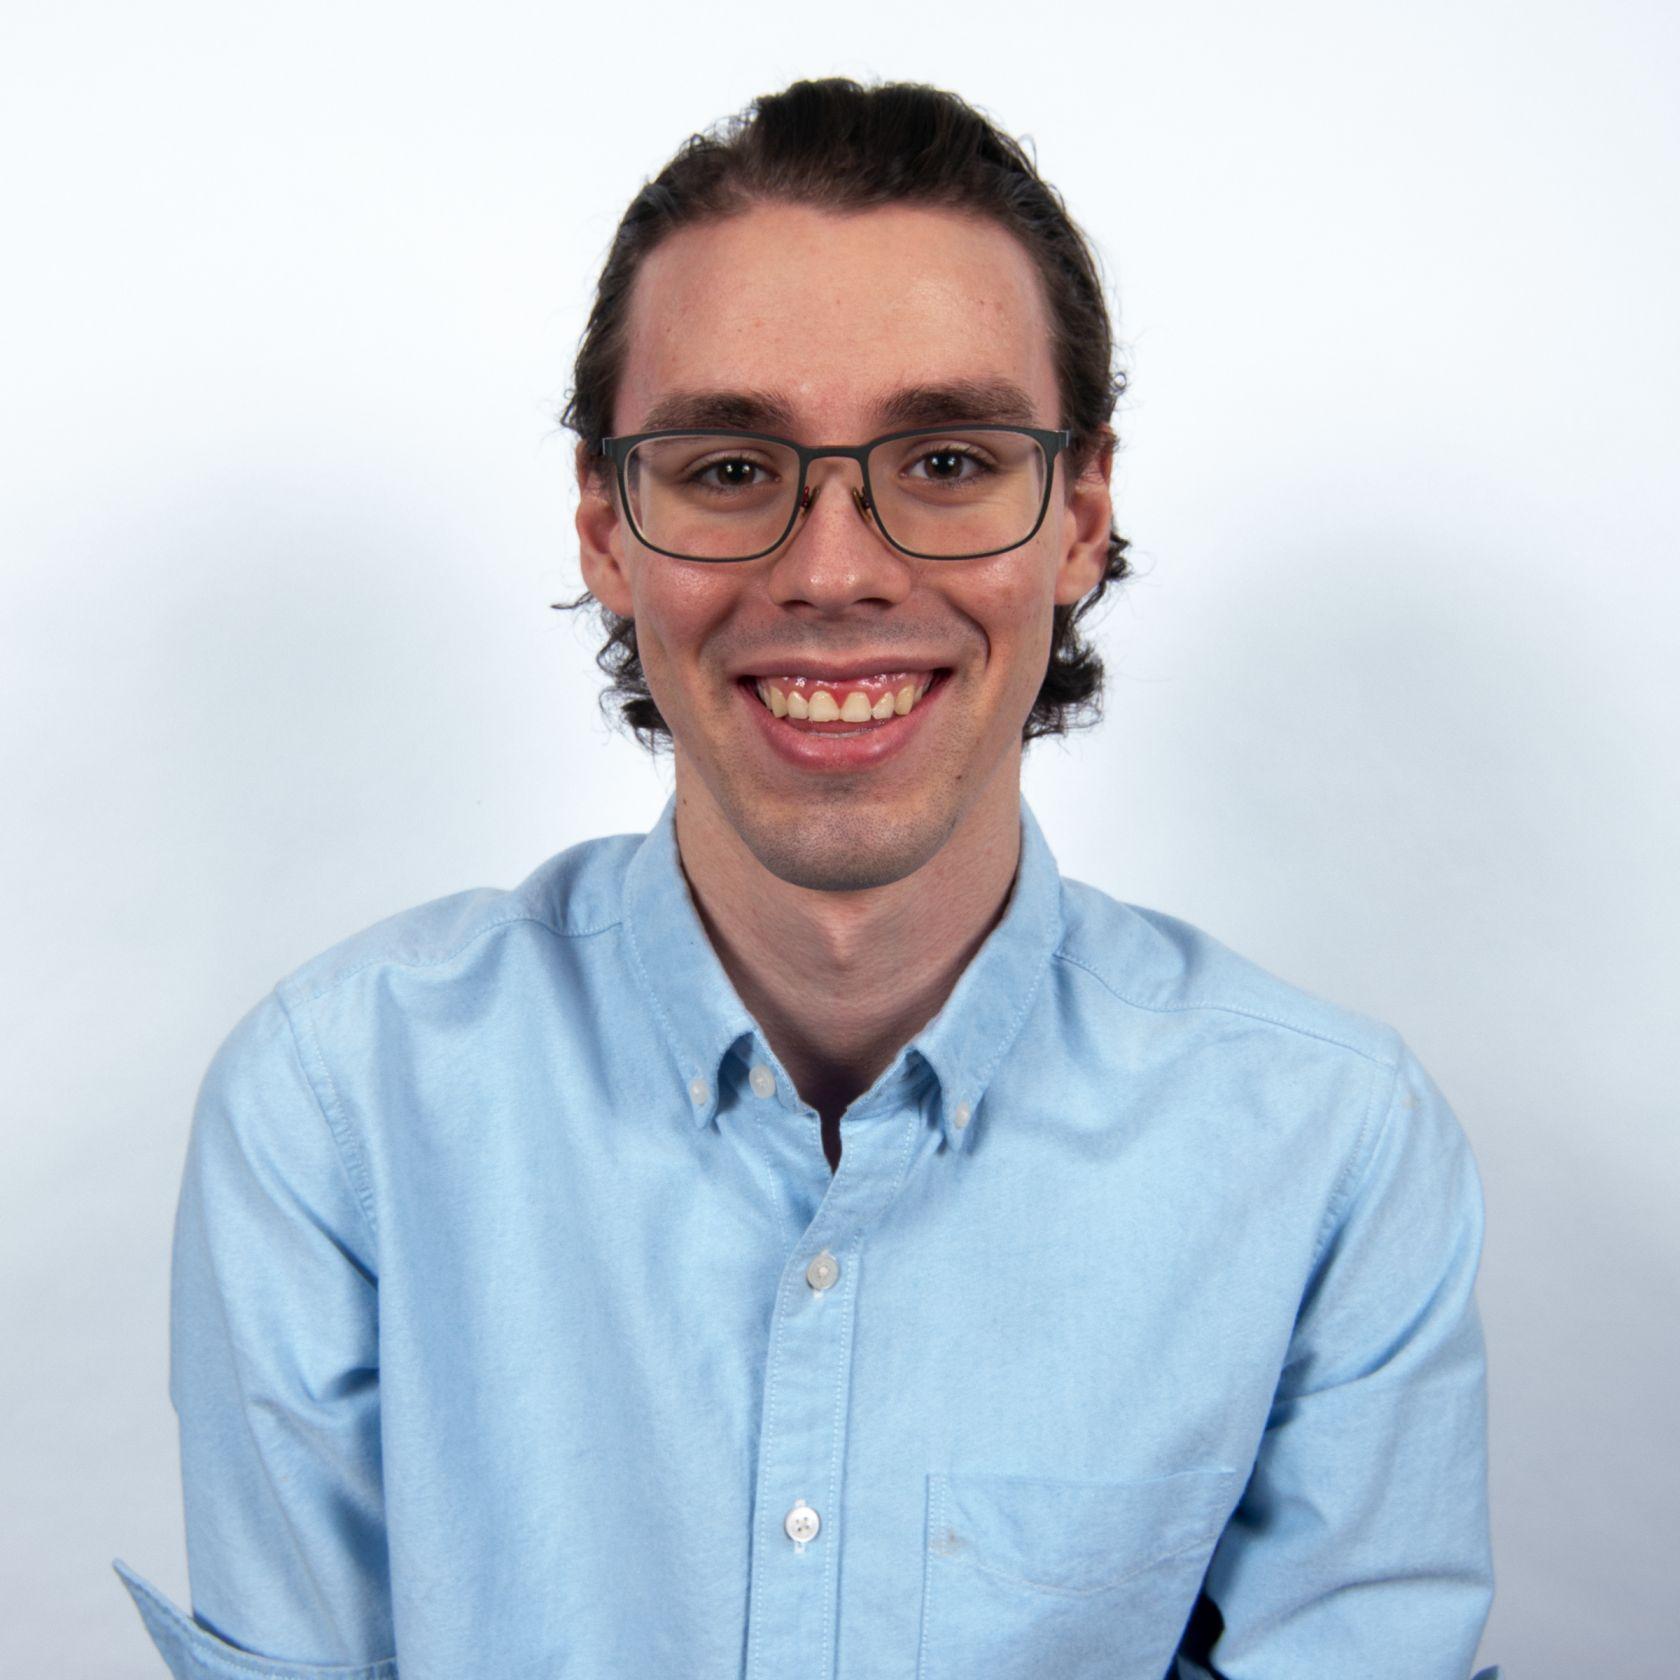 Photo of FMTV Graduate Christopher Rupert